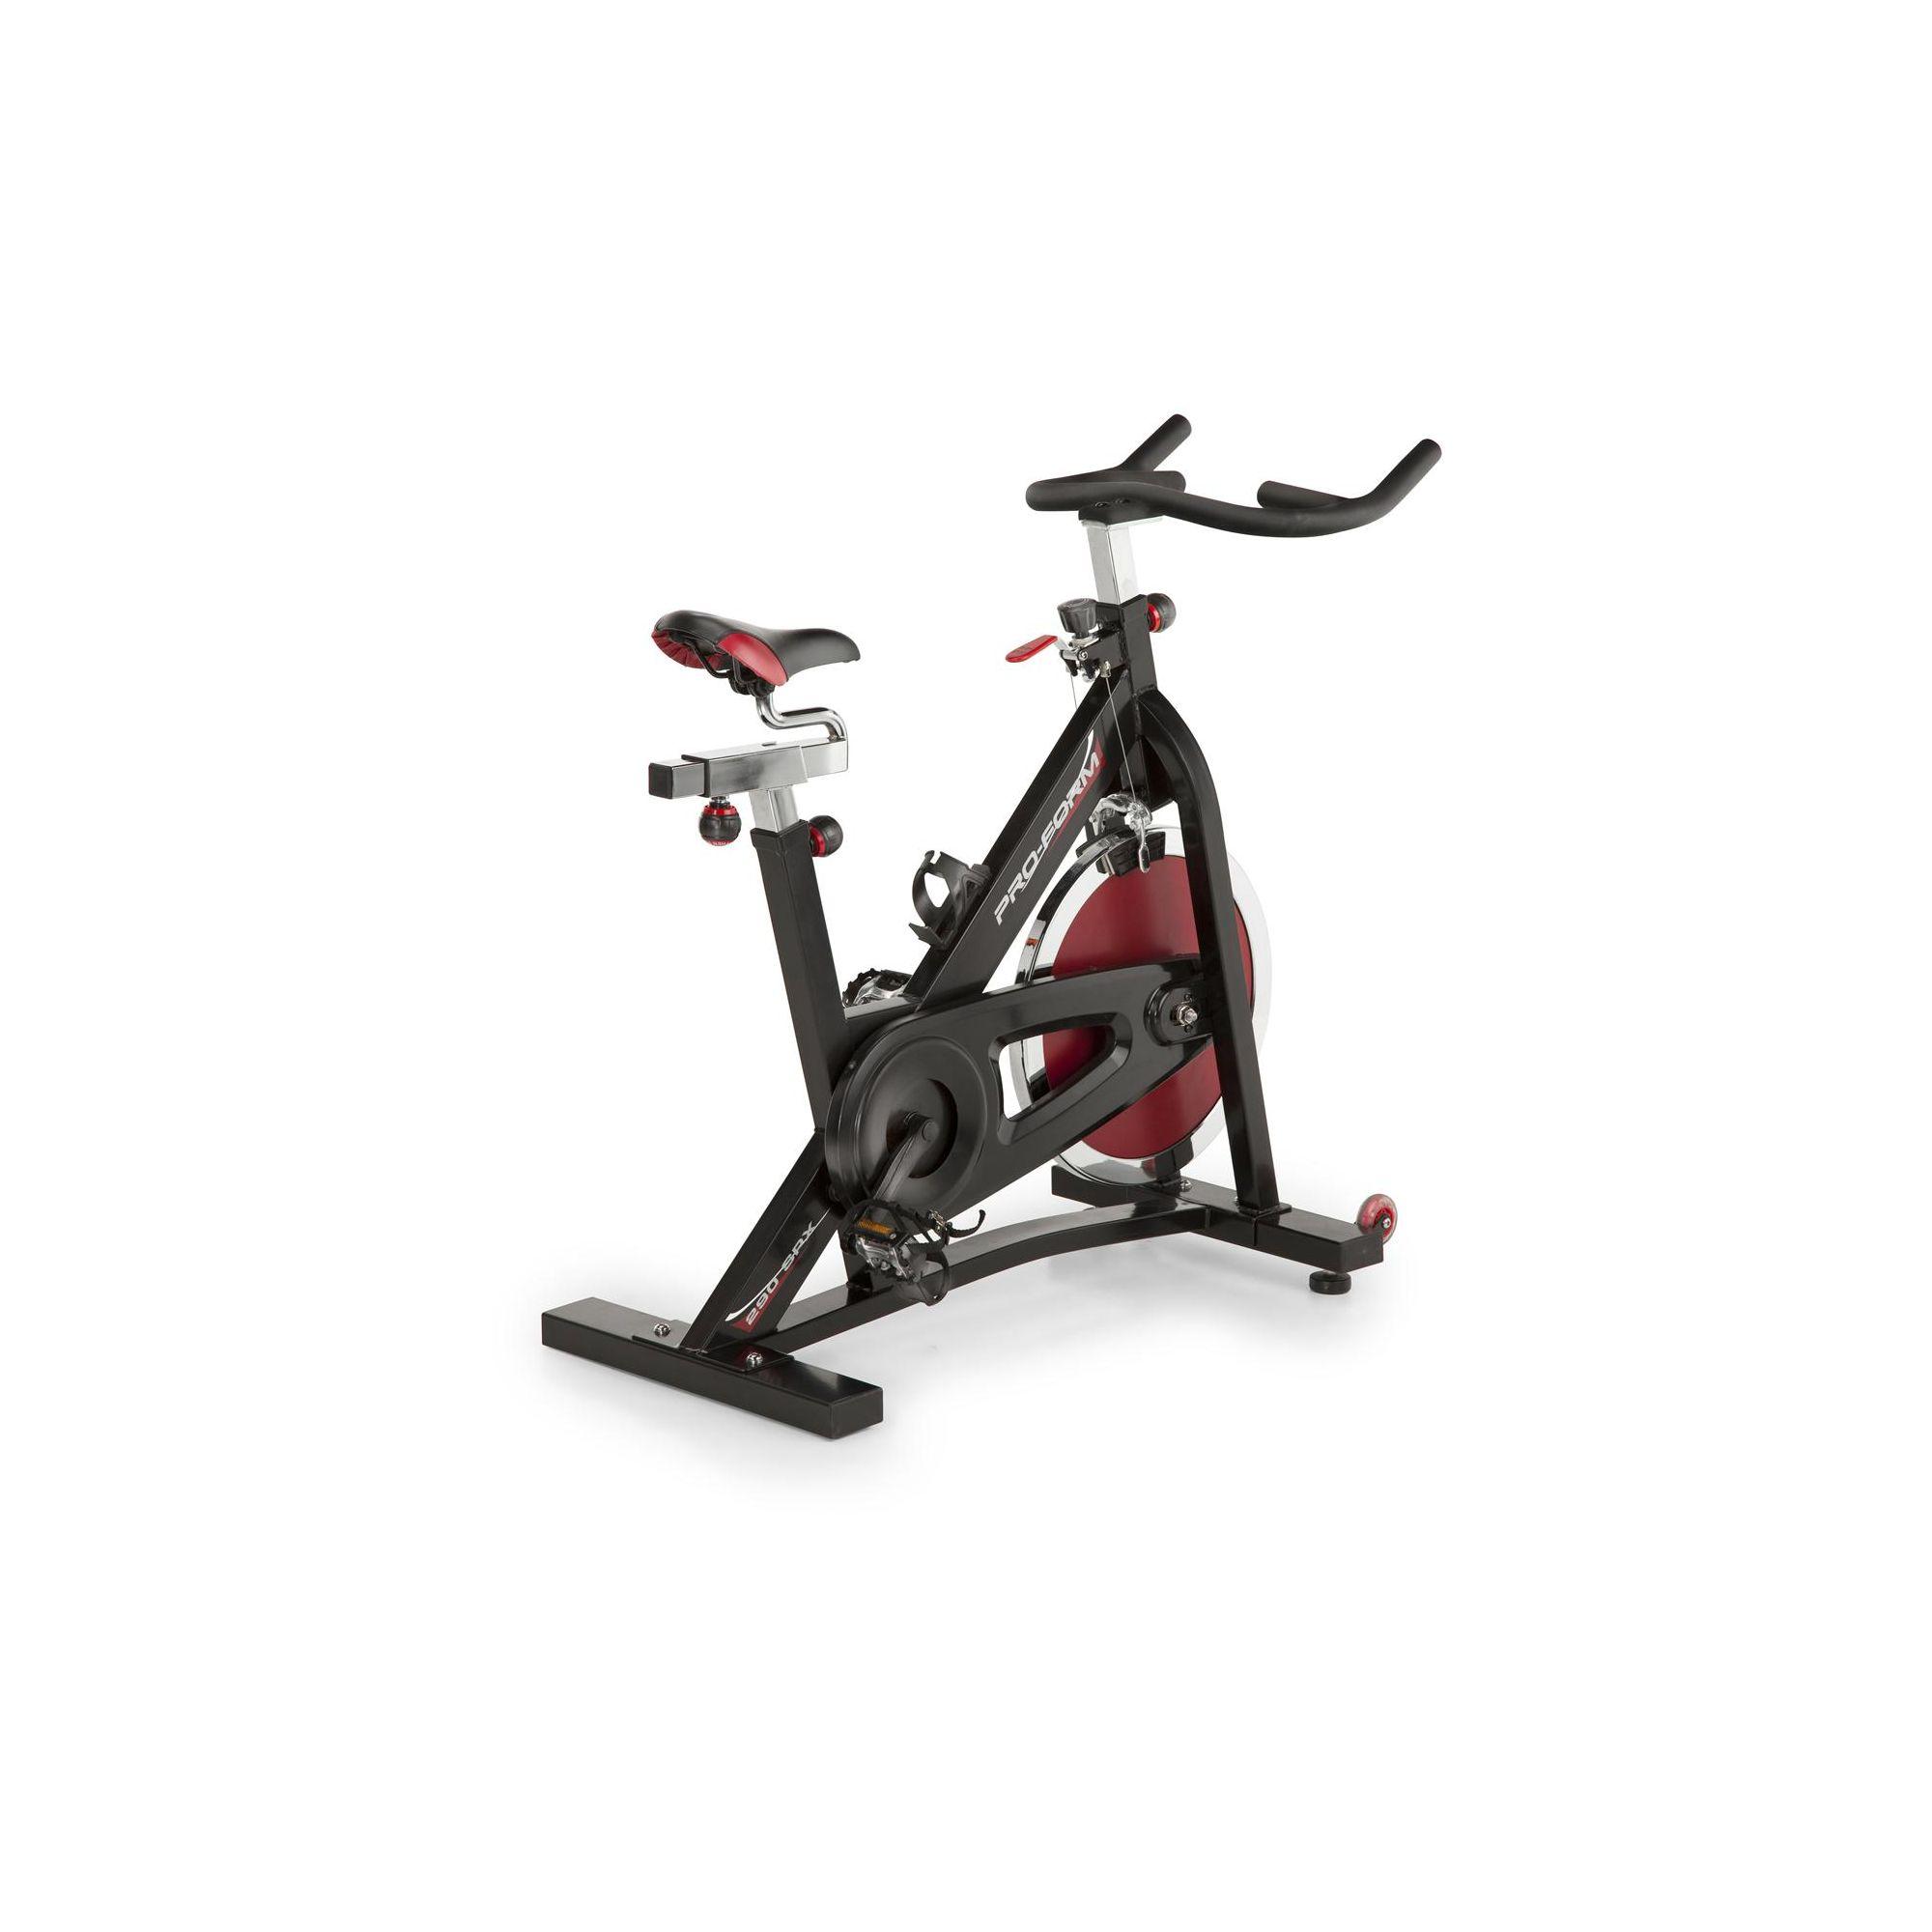 Pro-Form 290 SPX Exercise Bike Indoor